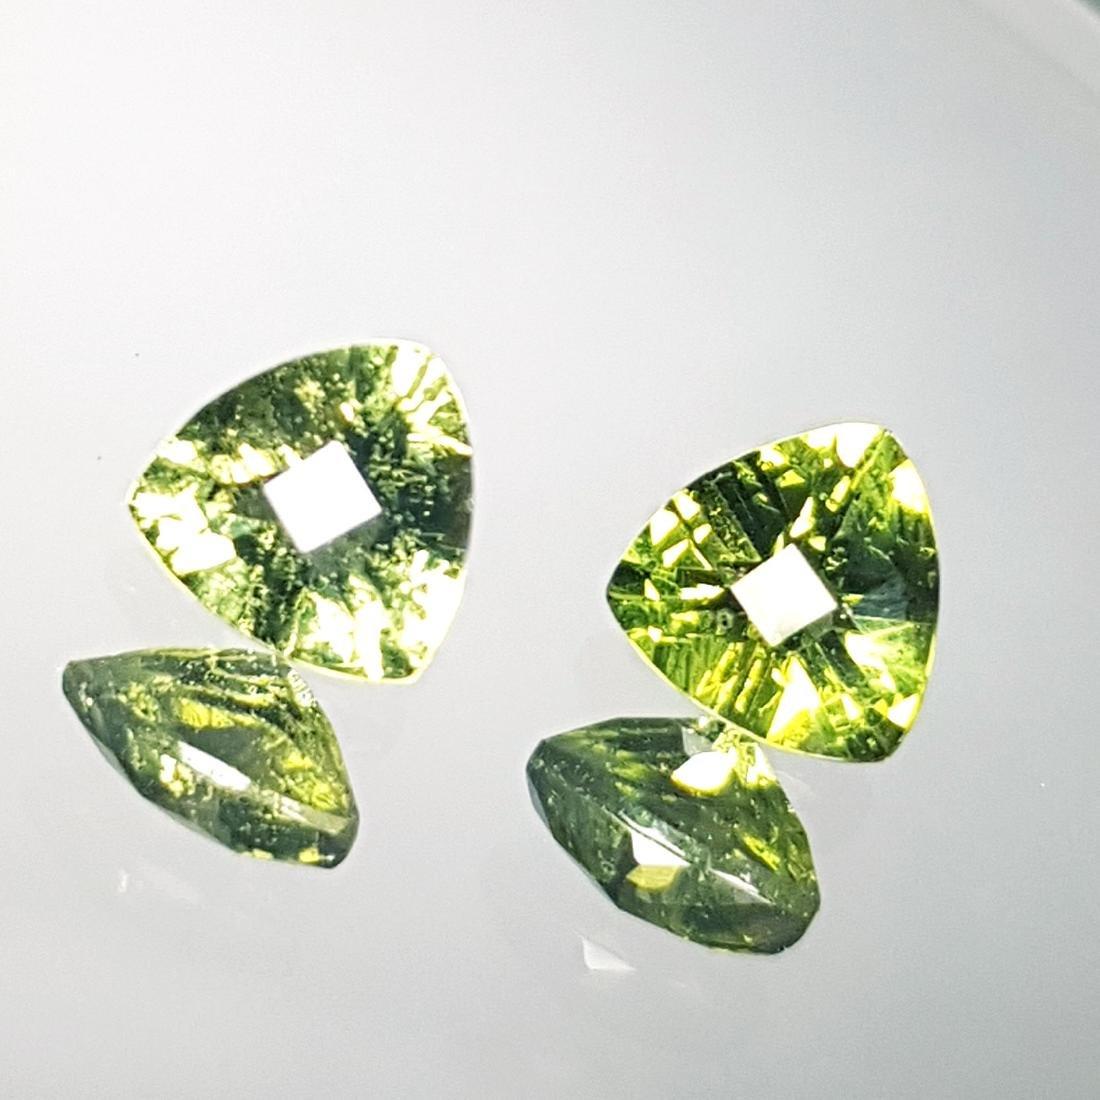 2 Pcs of Natural Moldavite - 1.14 ct